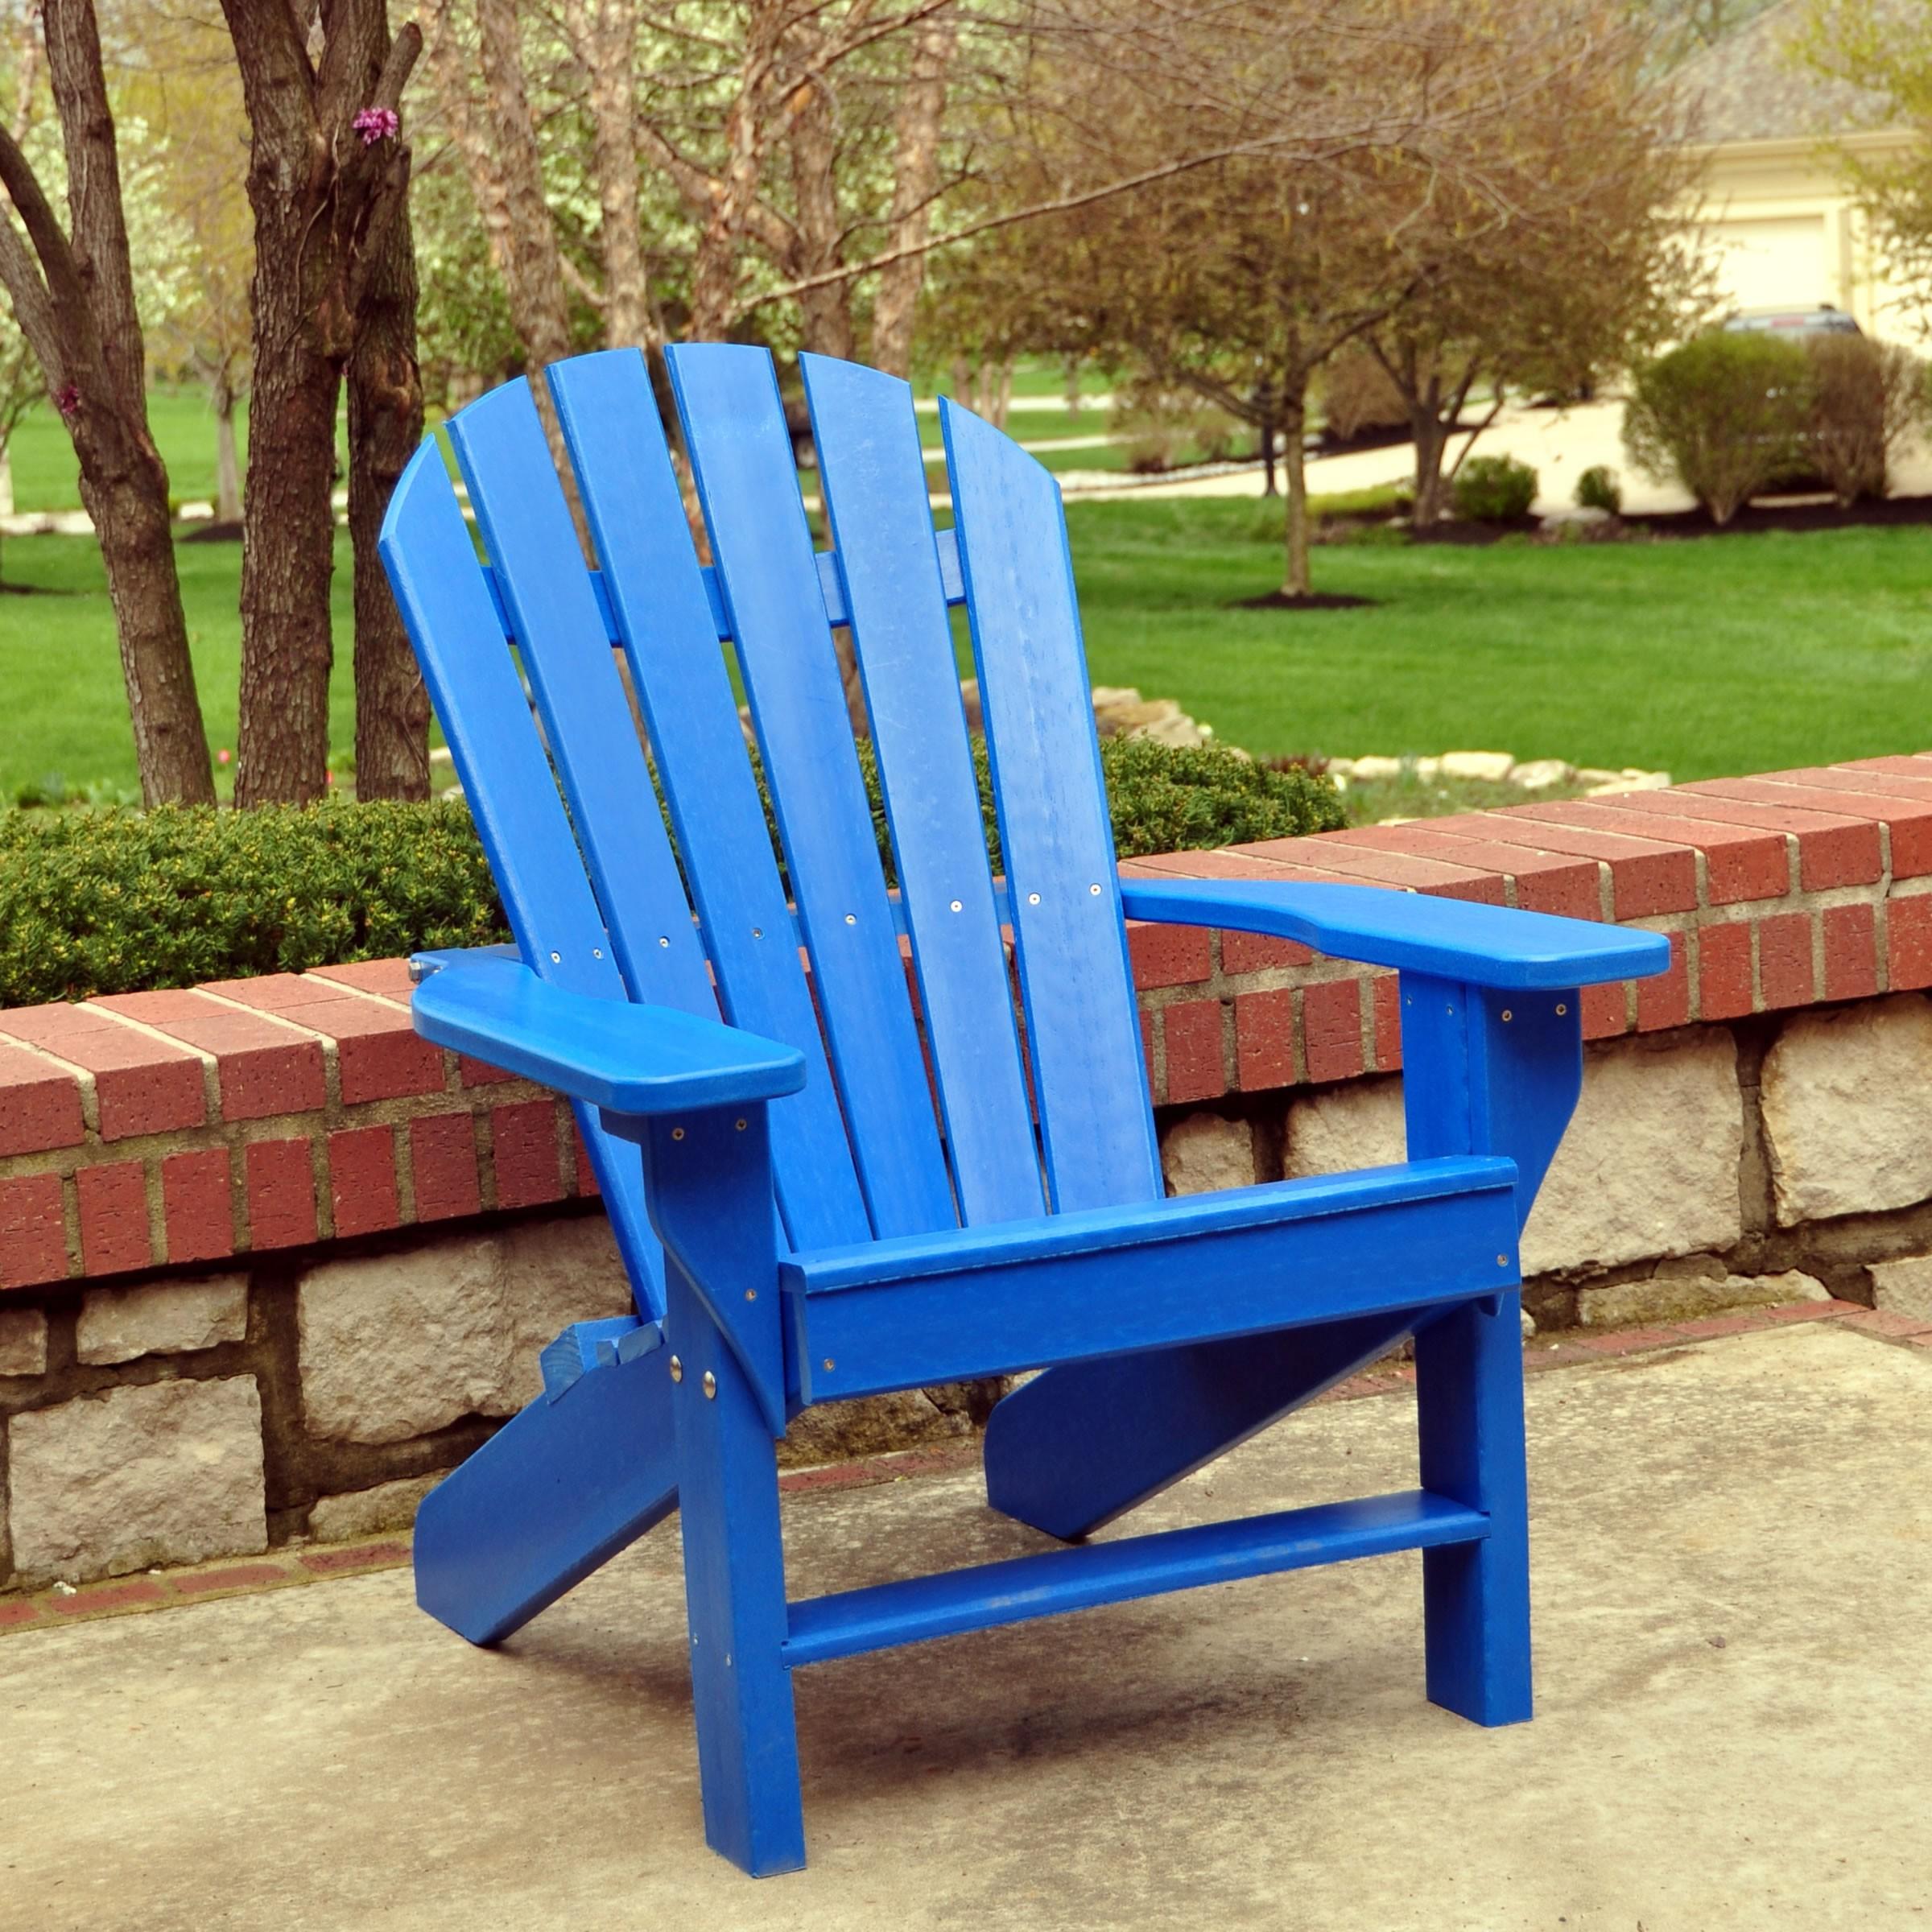 Frog Furnishings Seaside Adirondack Chair Blue